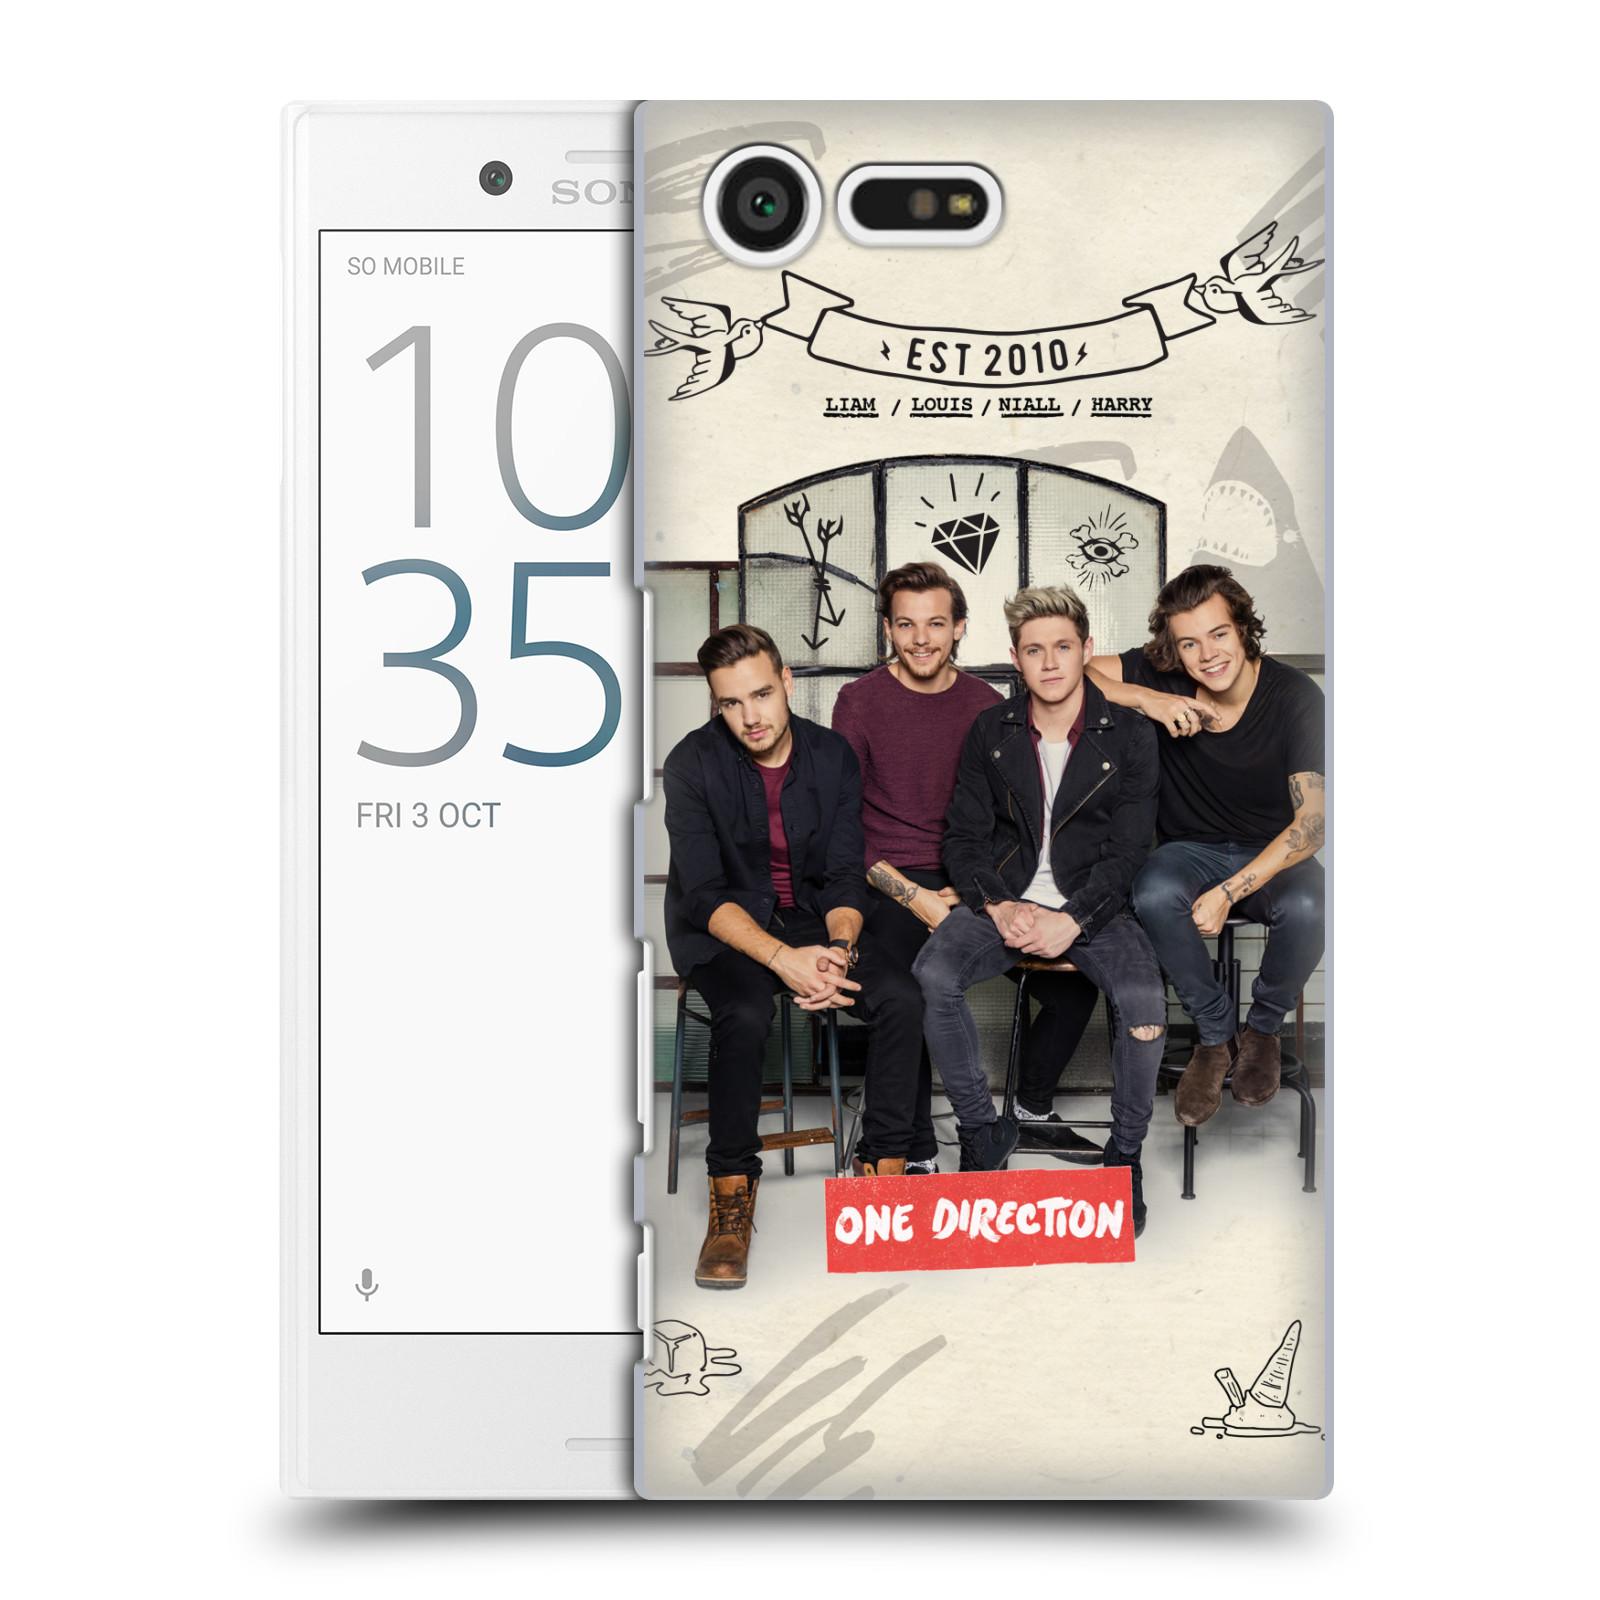 Plastové pouzdro na mobil Sony Xperia X Compact HEAD CASE One Direction - EST 2010